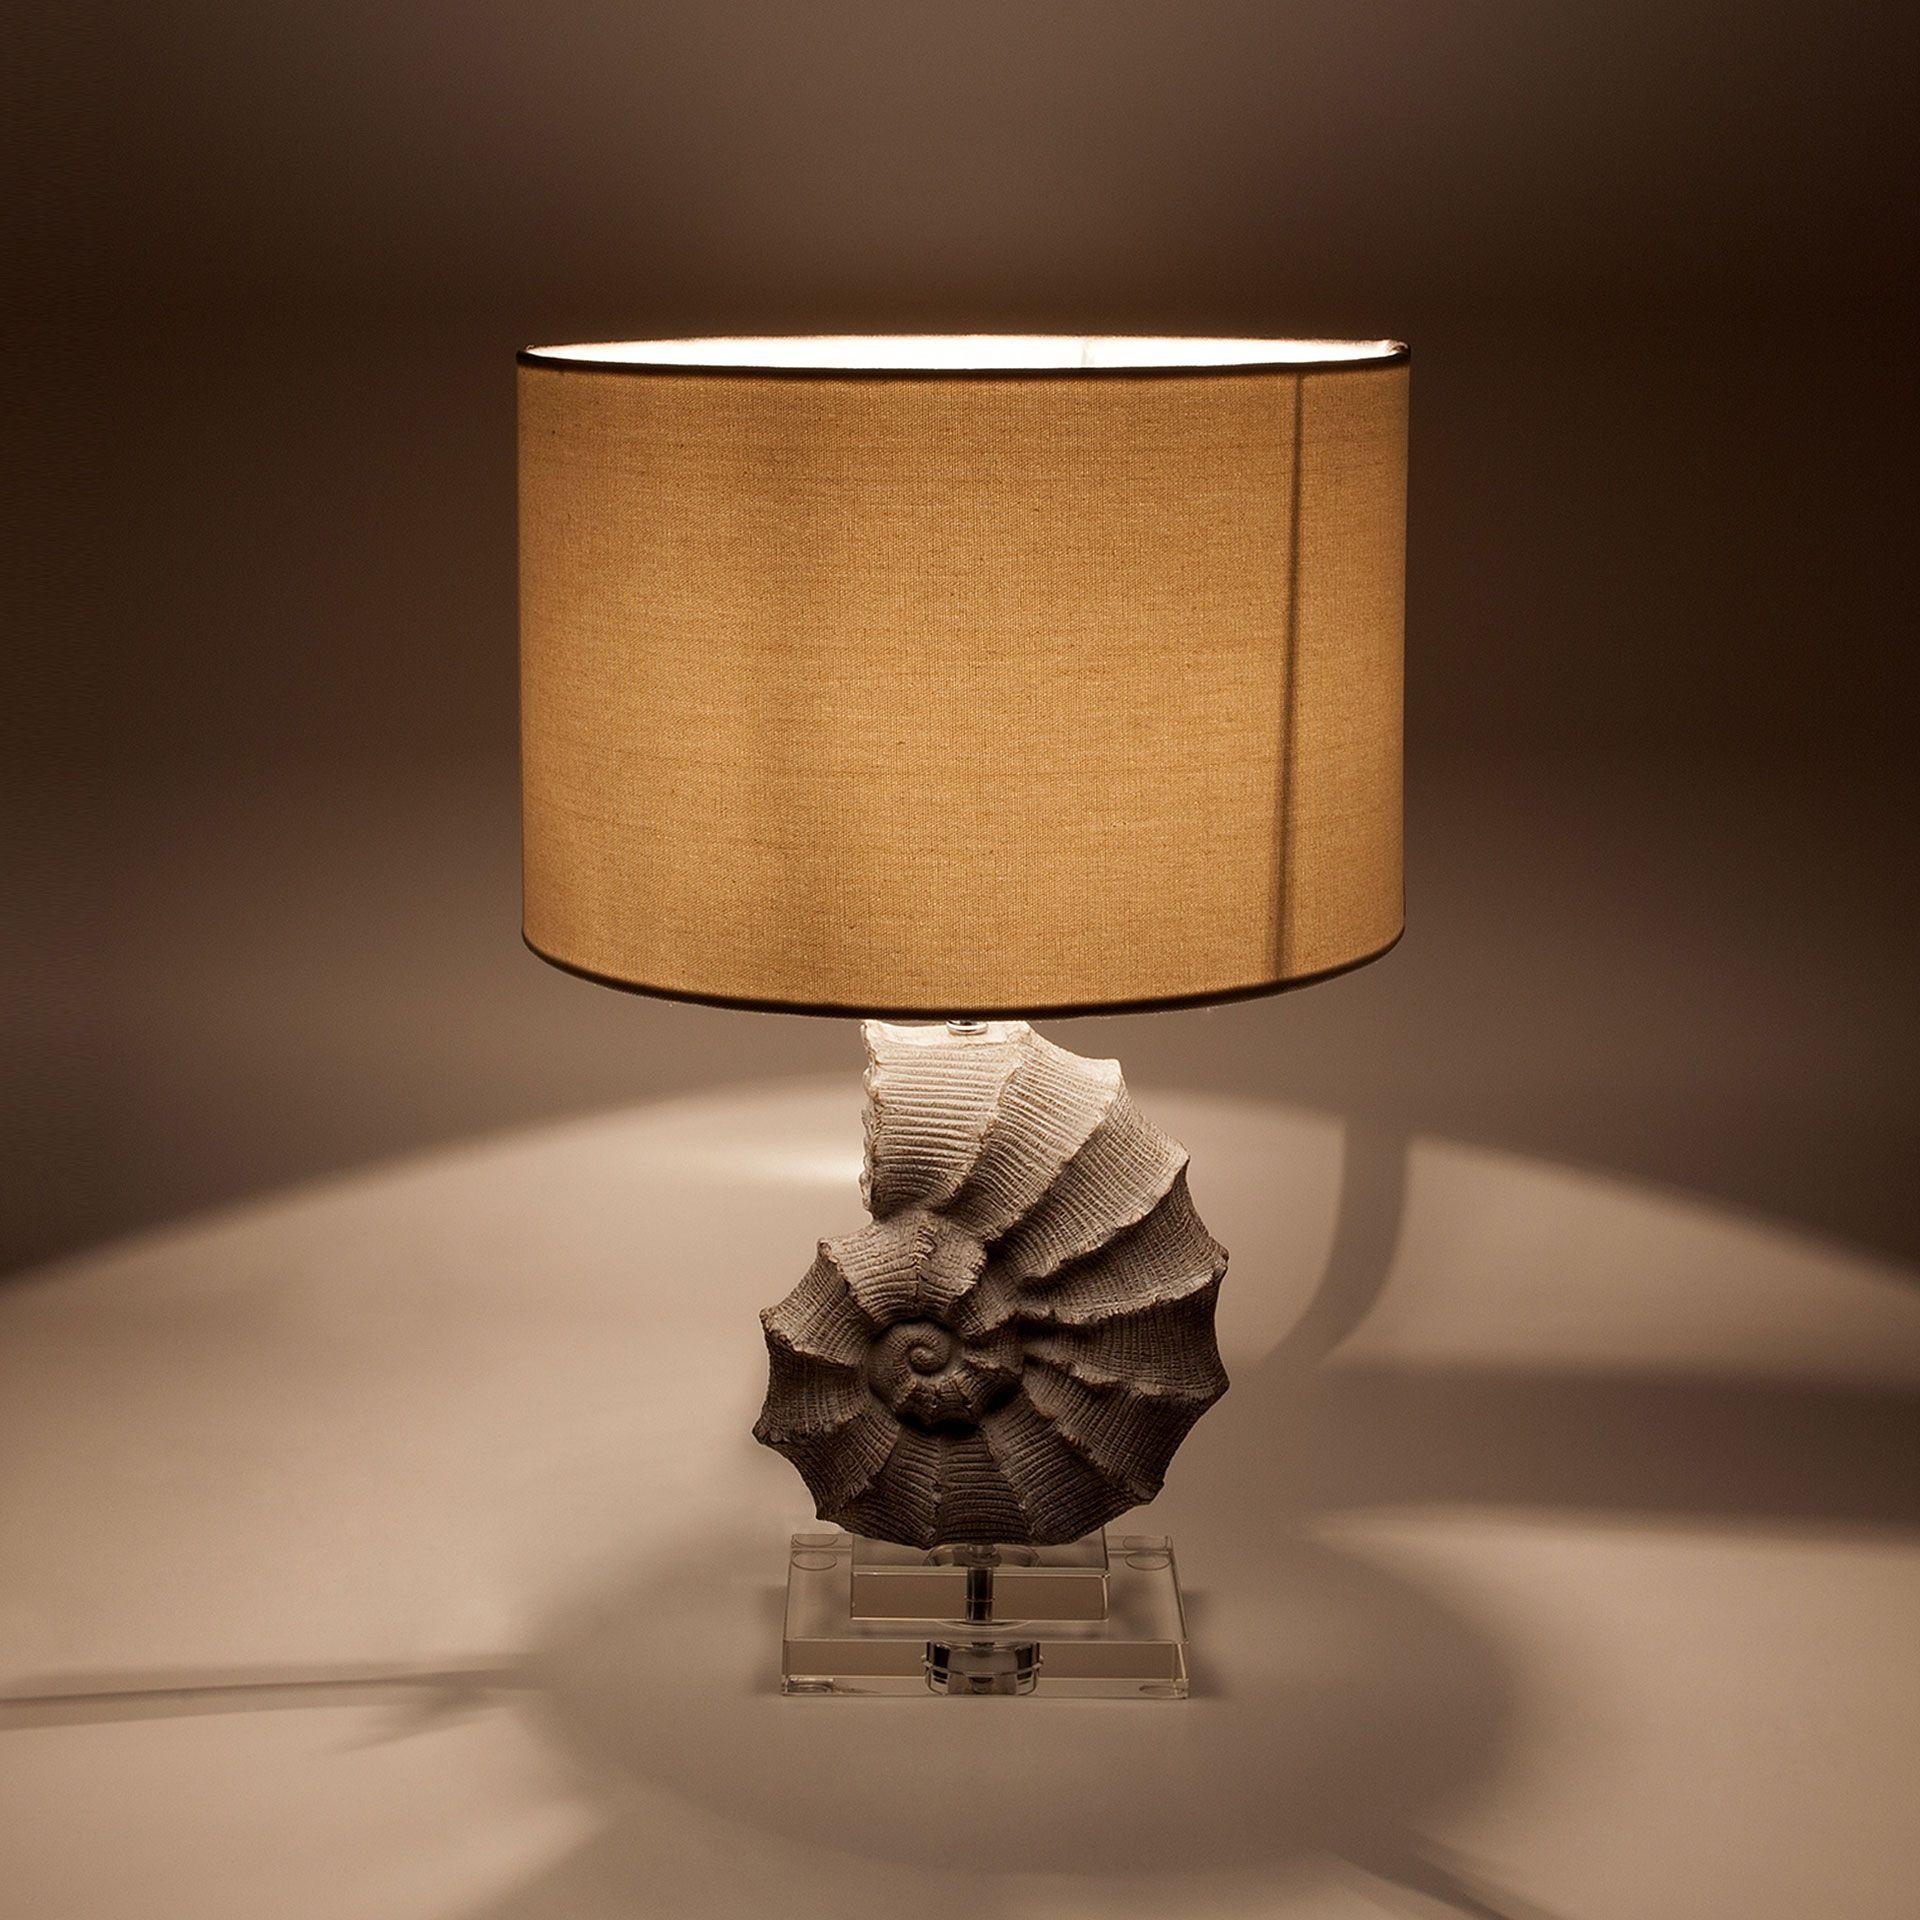 0de72588fbe2e9e08dbea838971d9ba3 Résultat Supérieur 60 Luxe Lampe Decorative Stock 2018 Ldkt